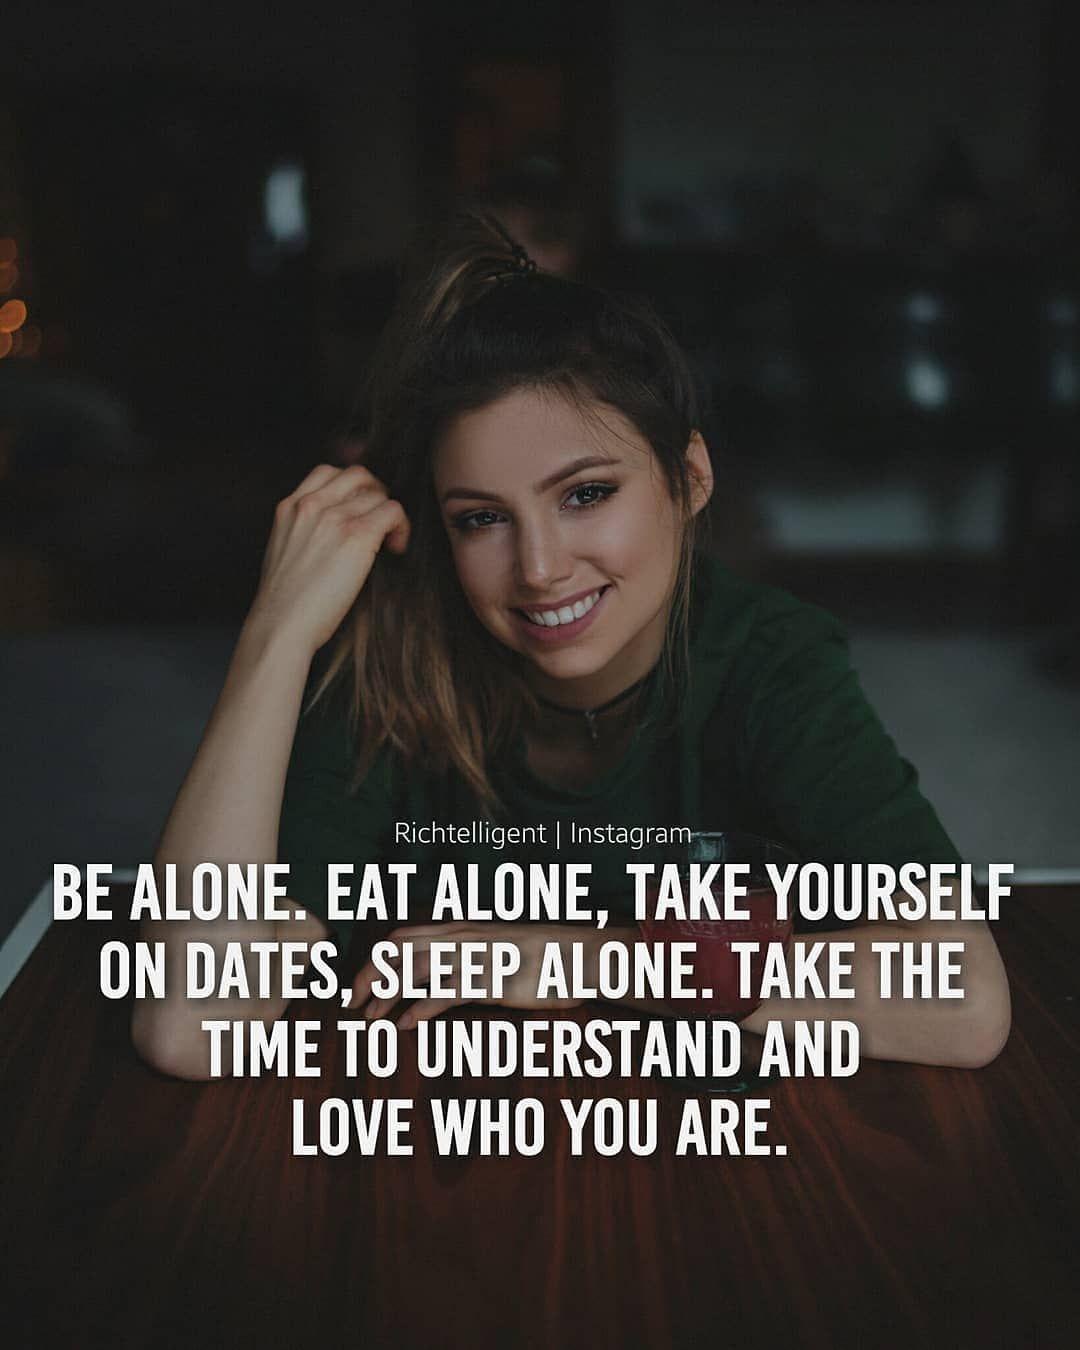 Funny Motivational Words Bsacxoiayzl Richtelligent Life Quotes Badass Quotes Study Motivation Quotes